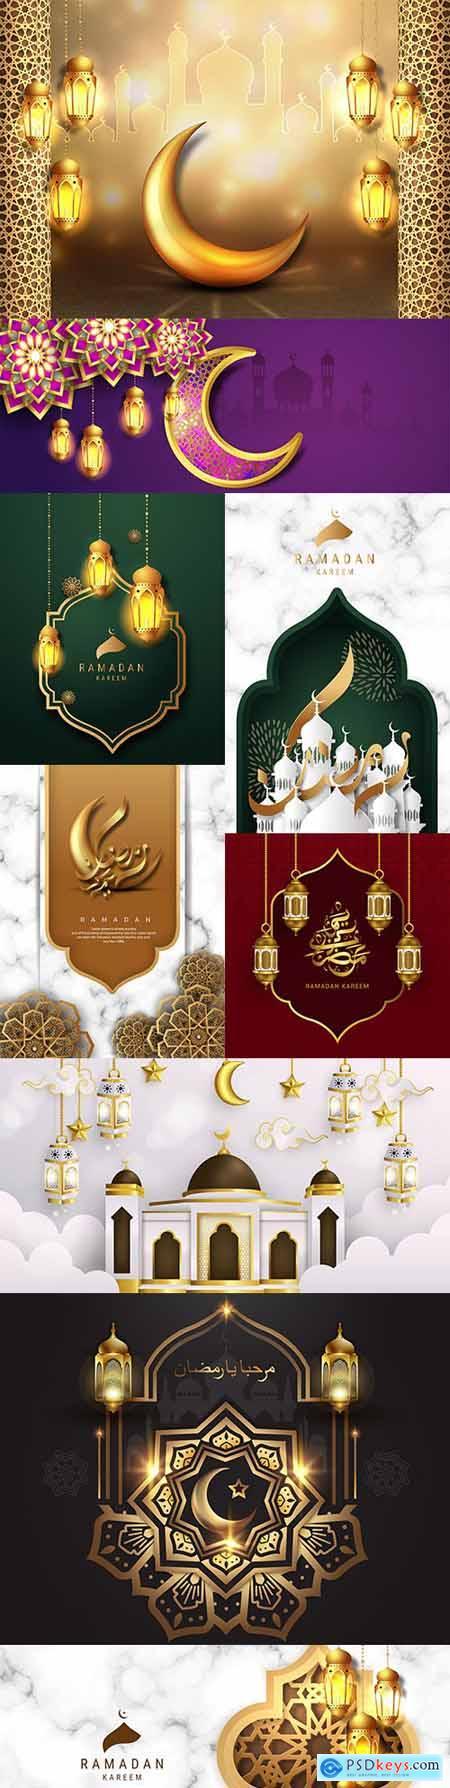 Ramadan Kareem Arabic calligraphy postcard gold design